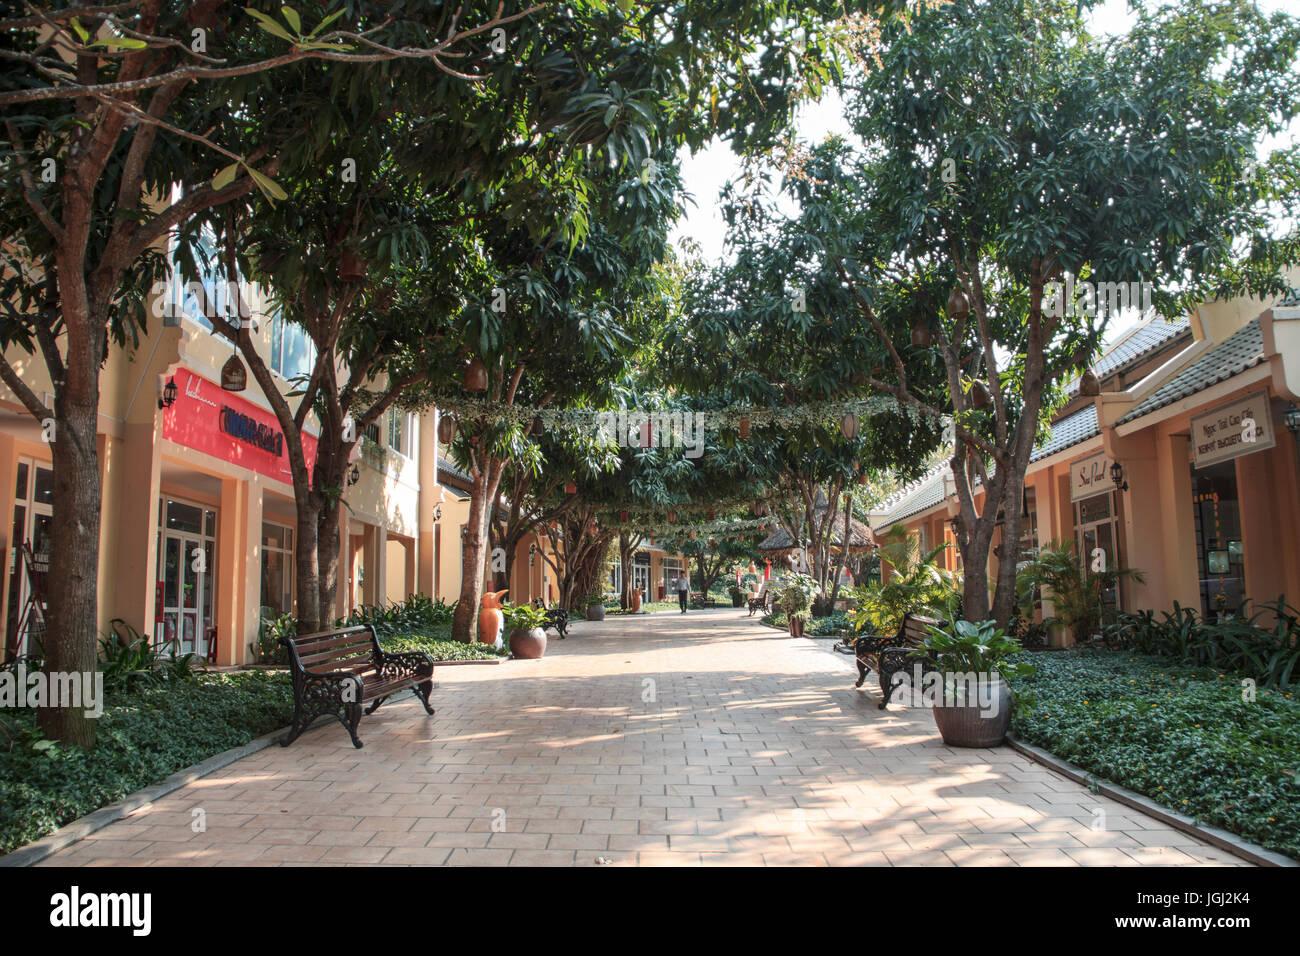 VINPEARL RESORT, NHA TRANG, VIETNAM, MARCH 5, 2016 - Shopping mall street. - Stock Image